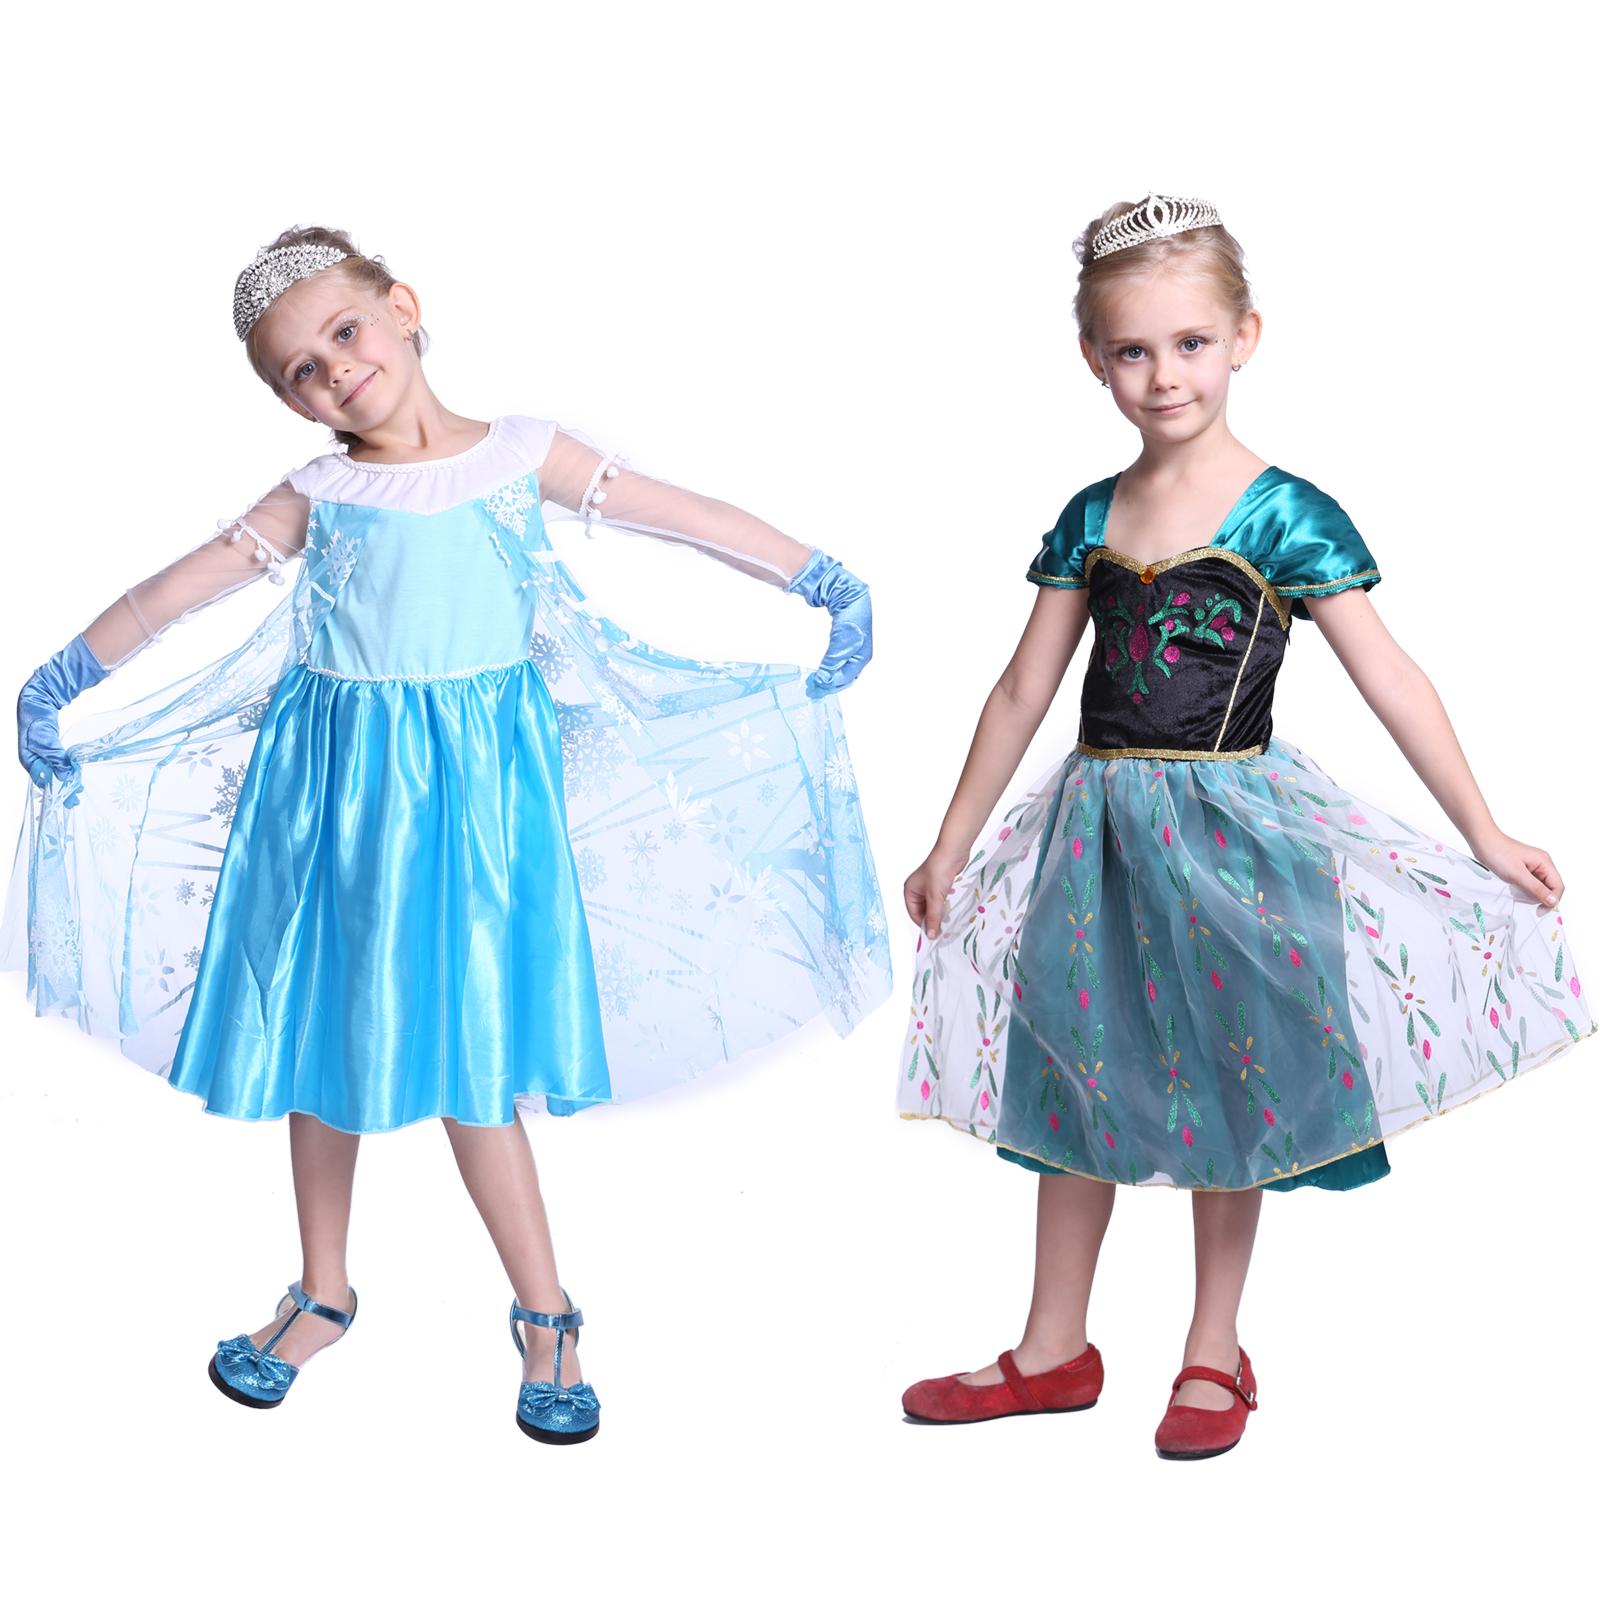 robe fille reine elsa princesse anna neiges frozen deguisement costume 2 6 ans ebay. Black Bedroom Furniture Sets. Home Design Ideas